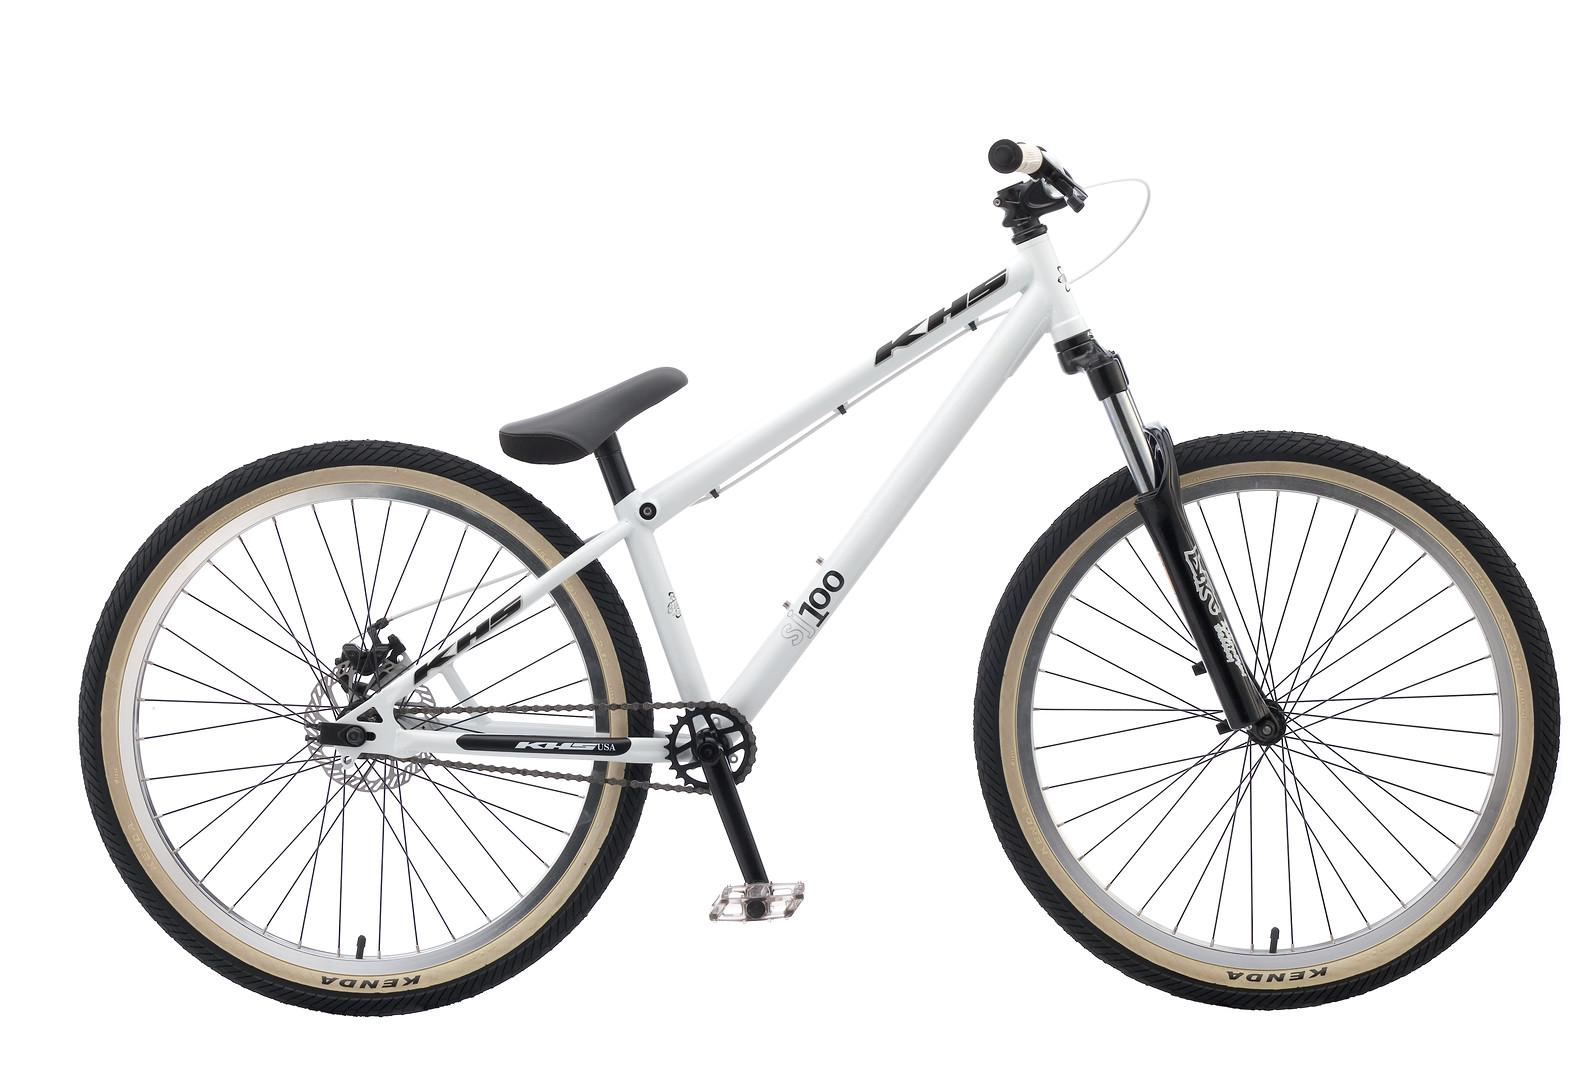 2013 KHS SJ100 Bike 2013 SJ100